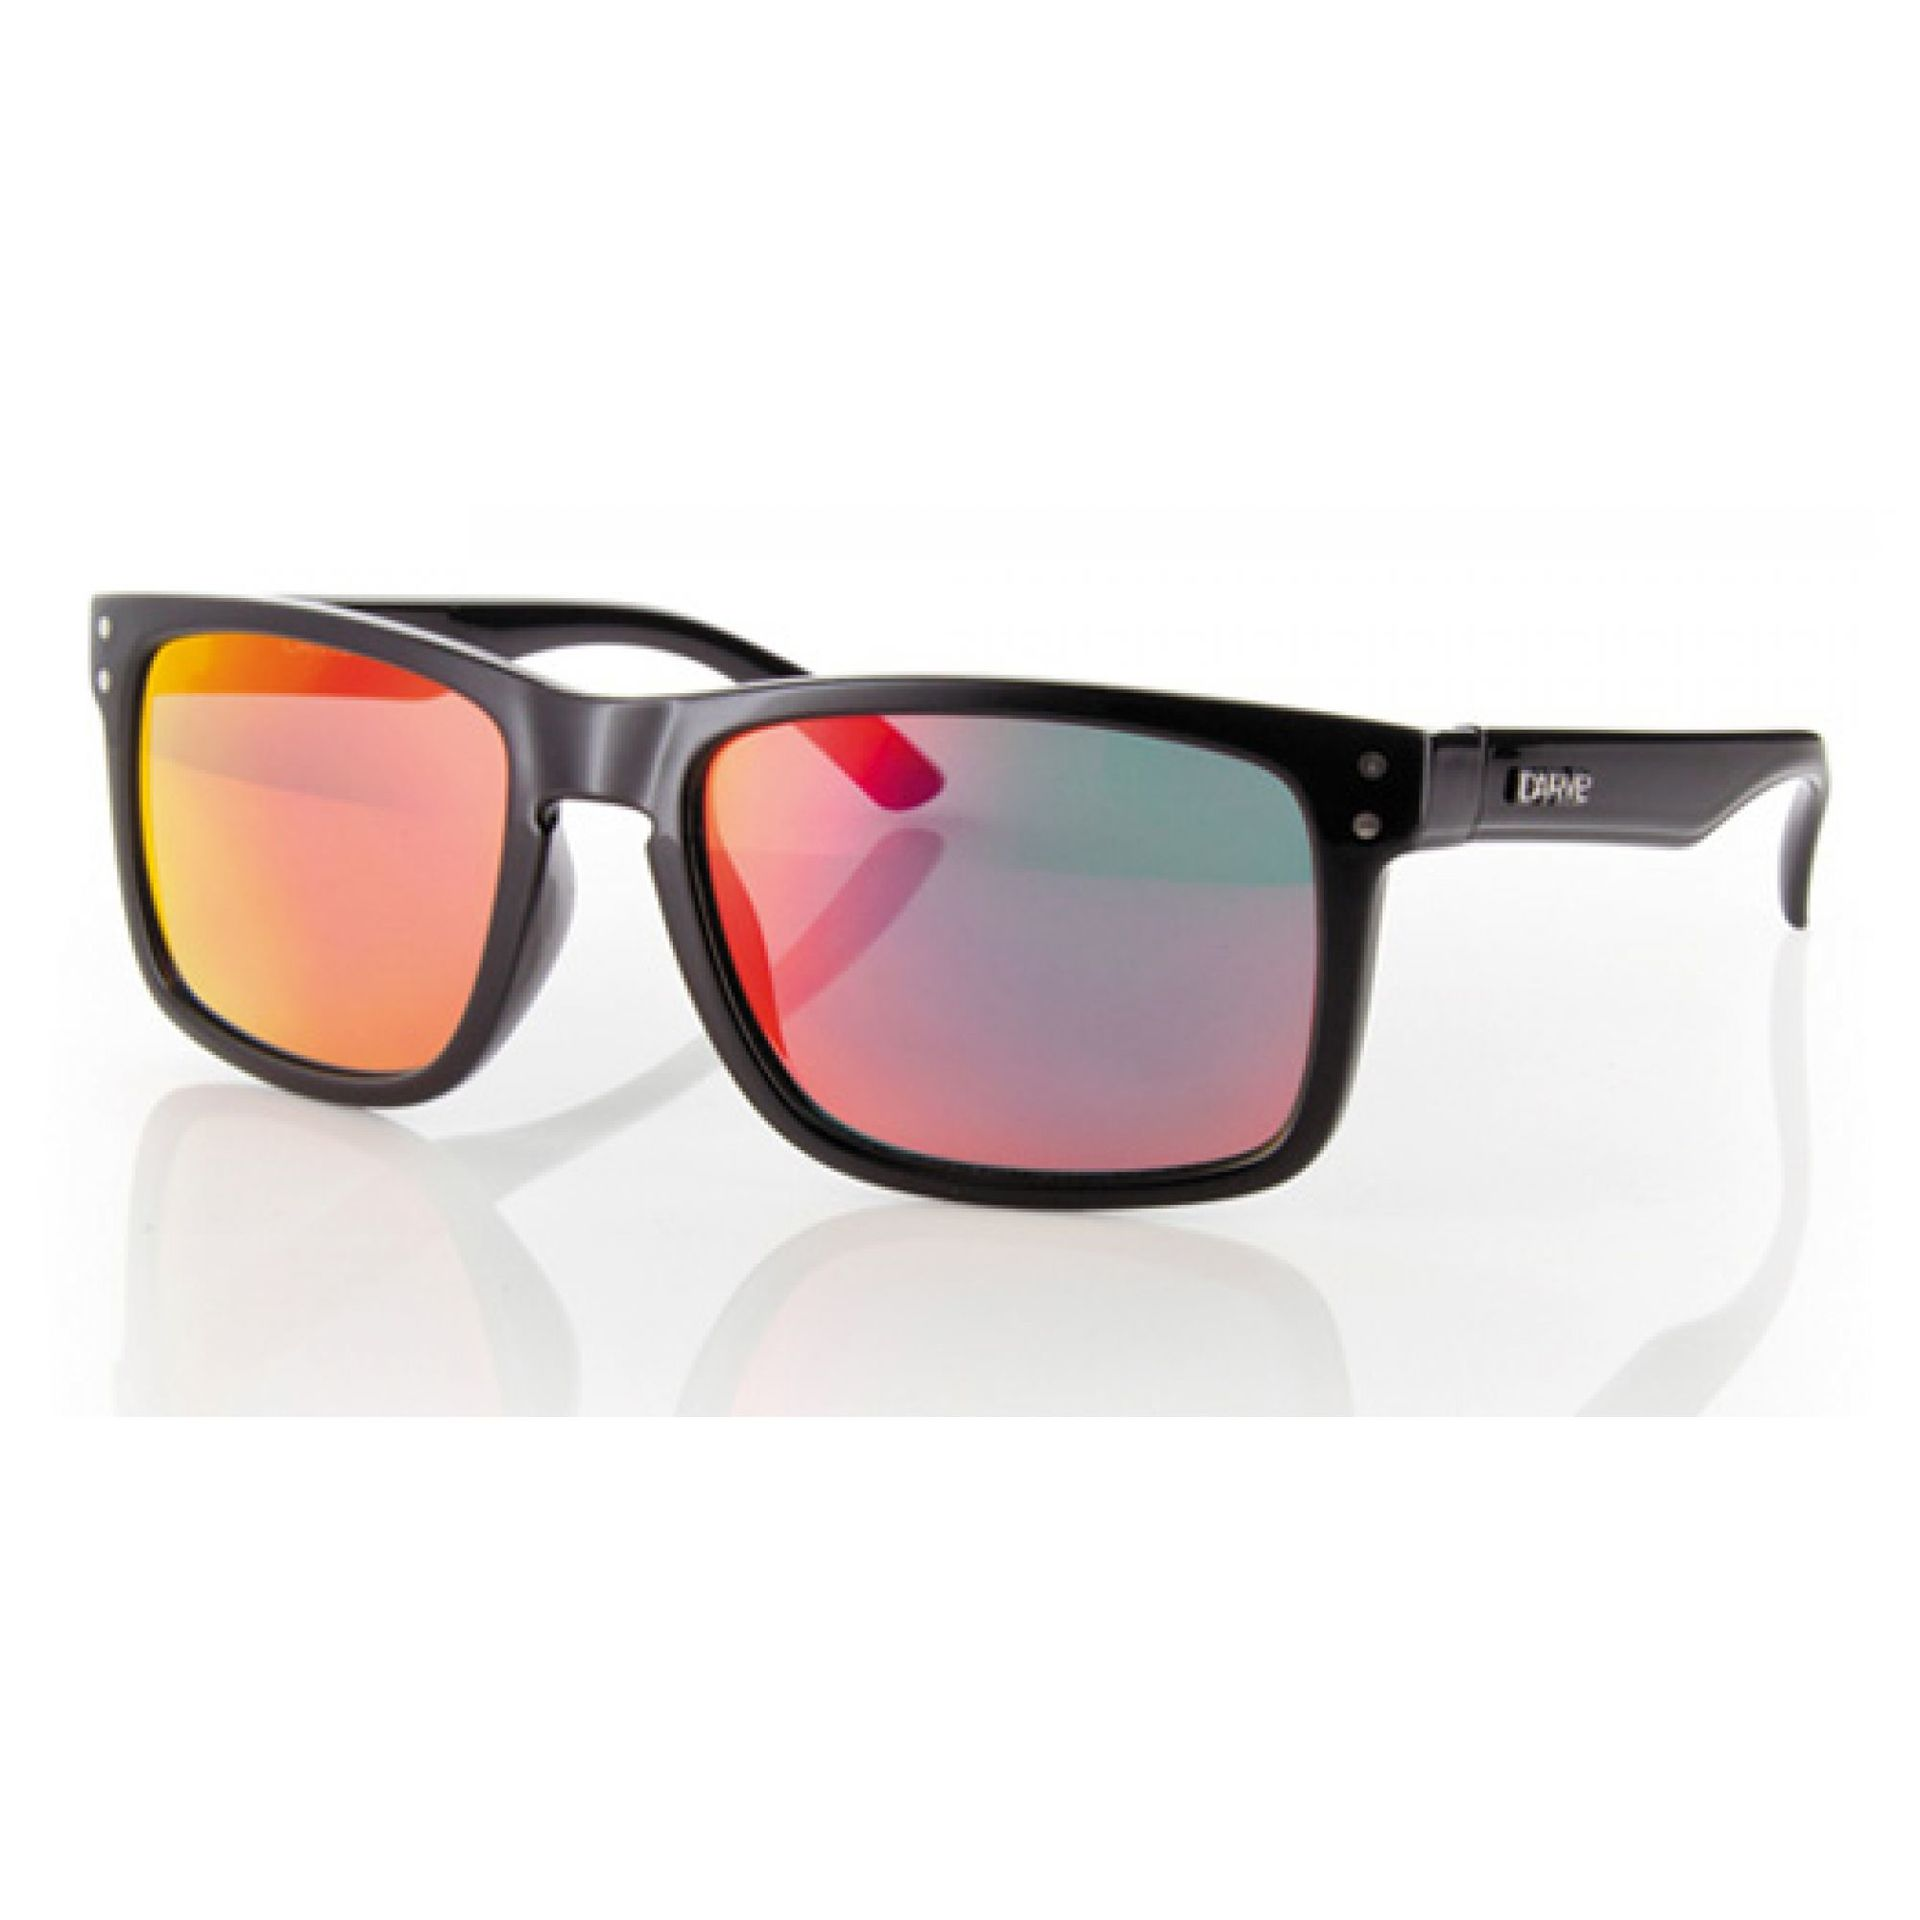 Okulary Carve Goblin czarne